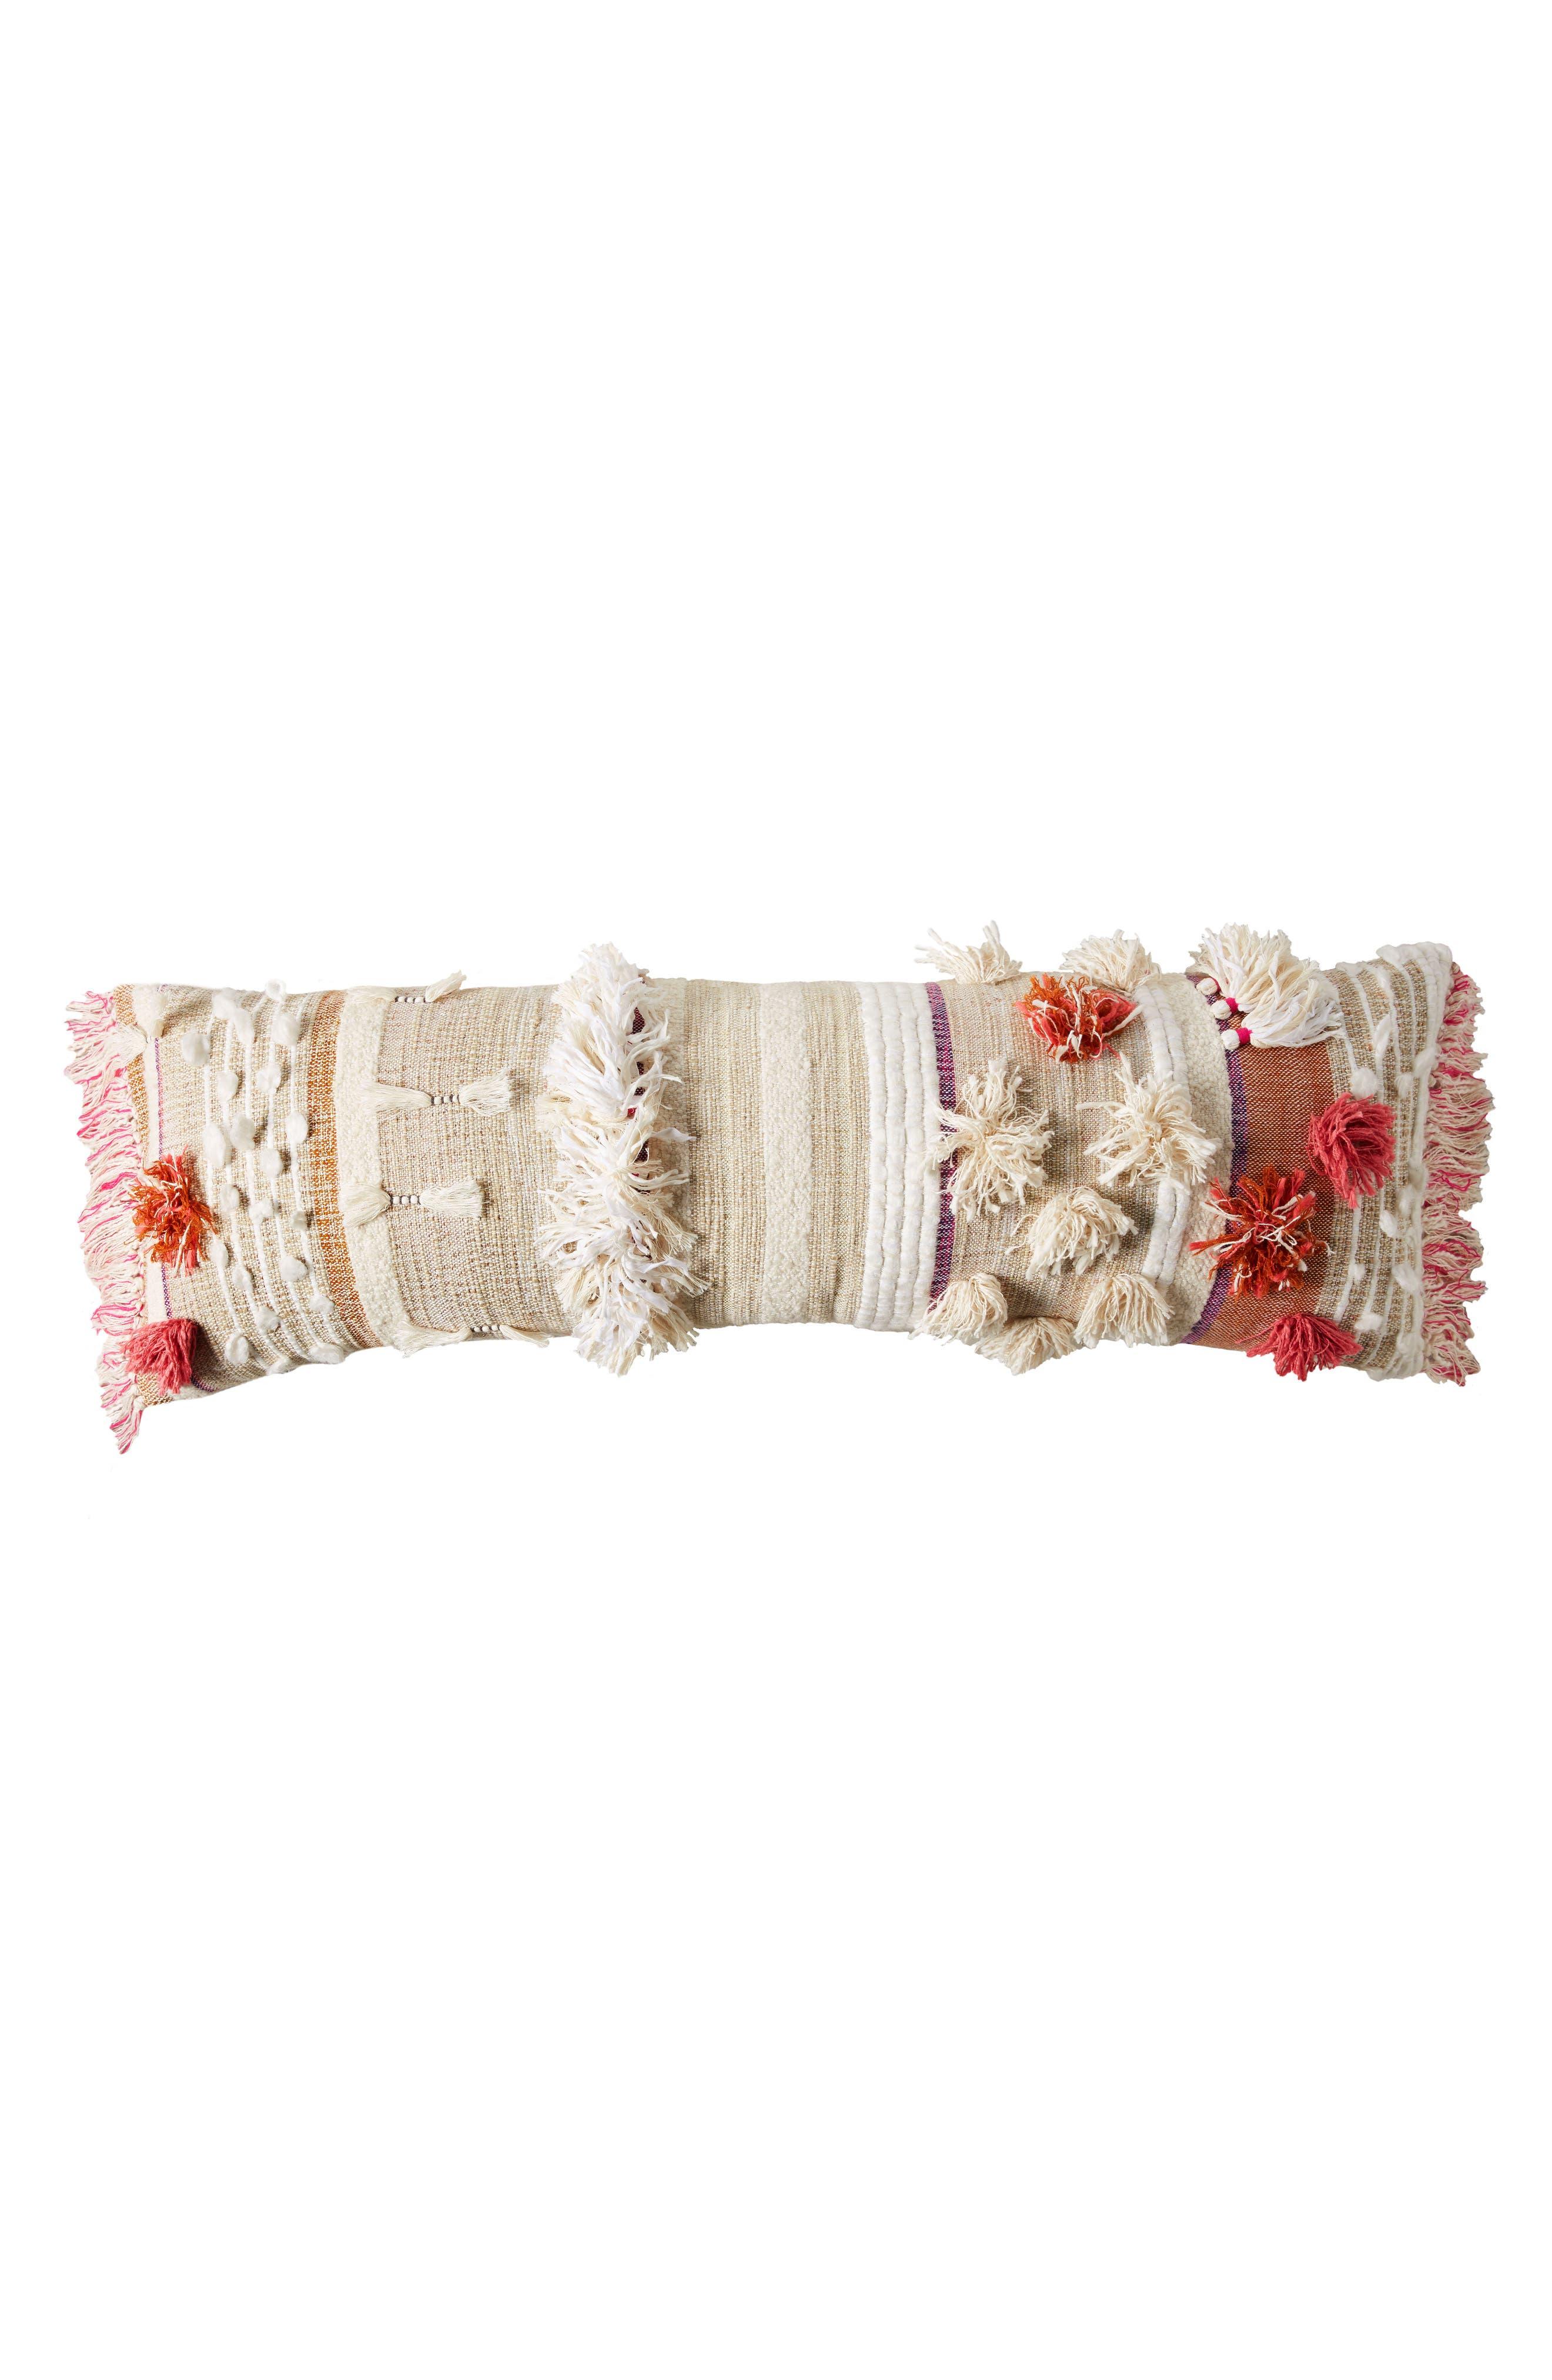 x All Roads Design Open Market Accent Pillow,                             Alternate thumbnail 6, color,                             Pink